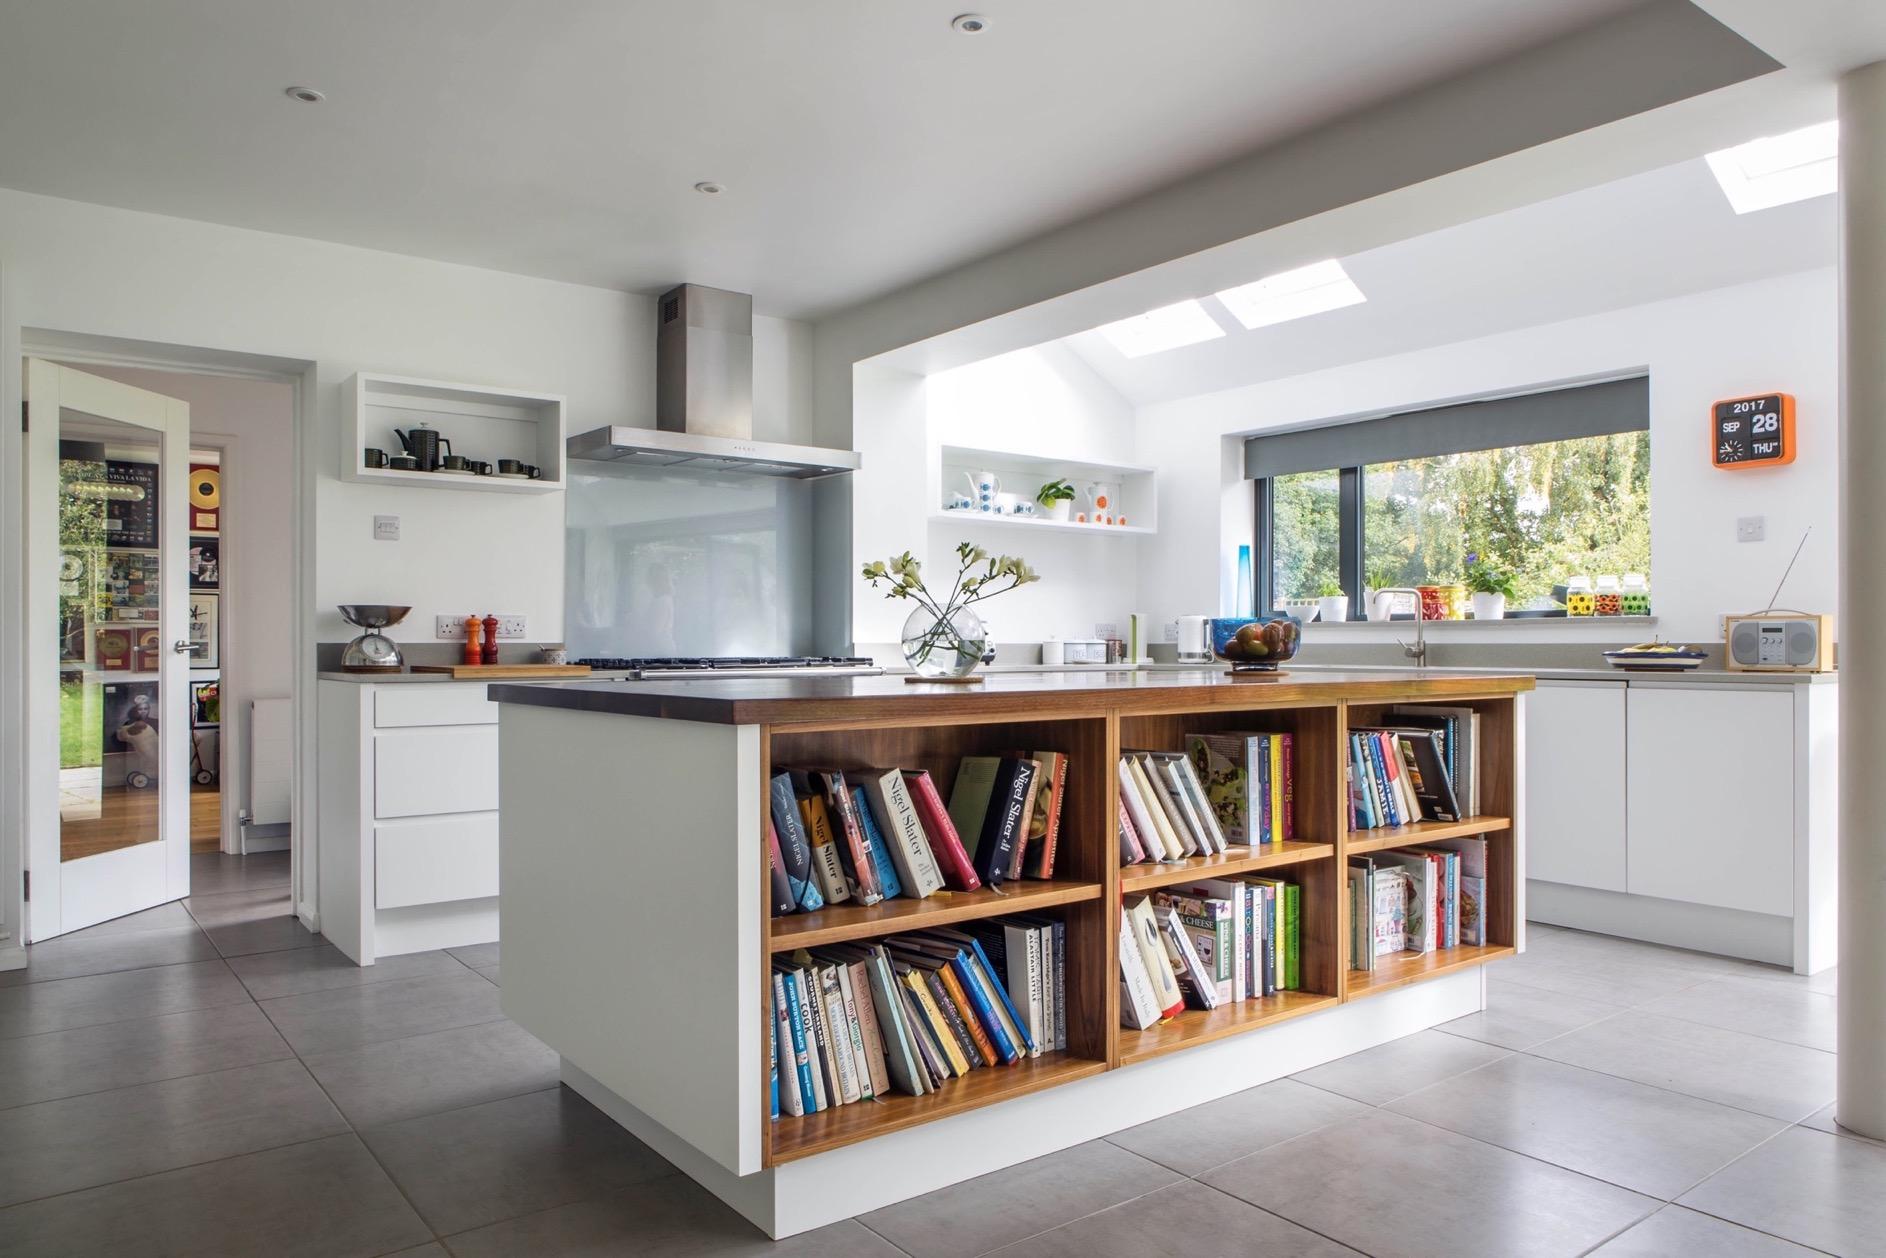 Walnut kitchen island bookshelves glass backsplash handleless aylesbury buckinghamshire 1